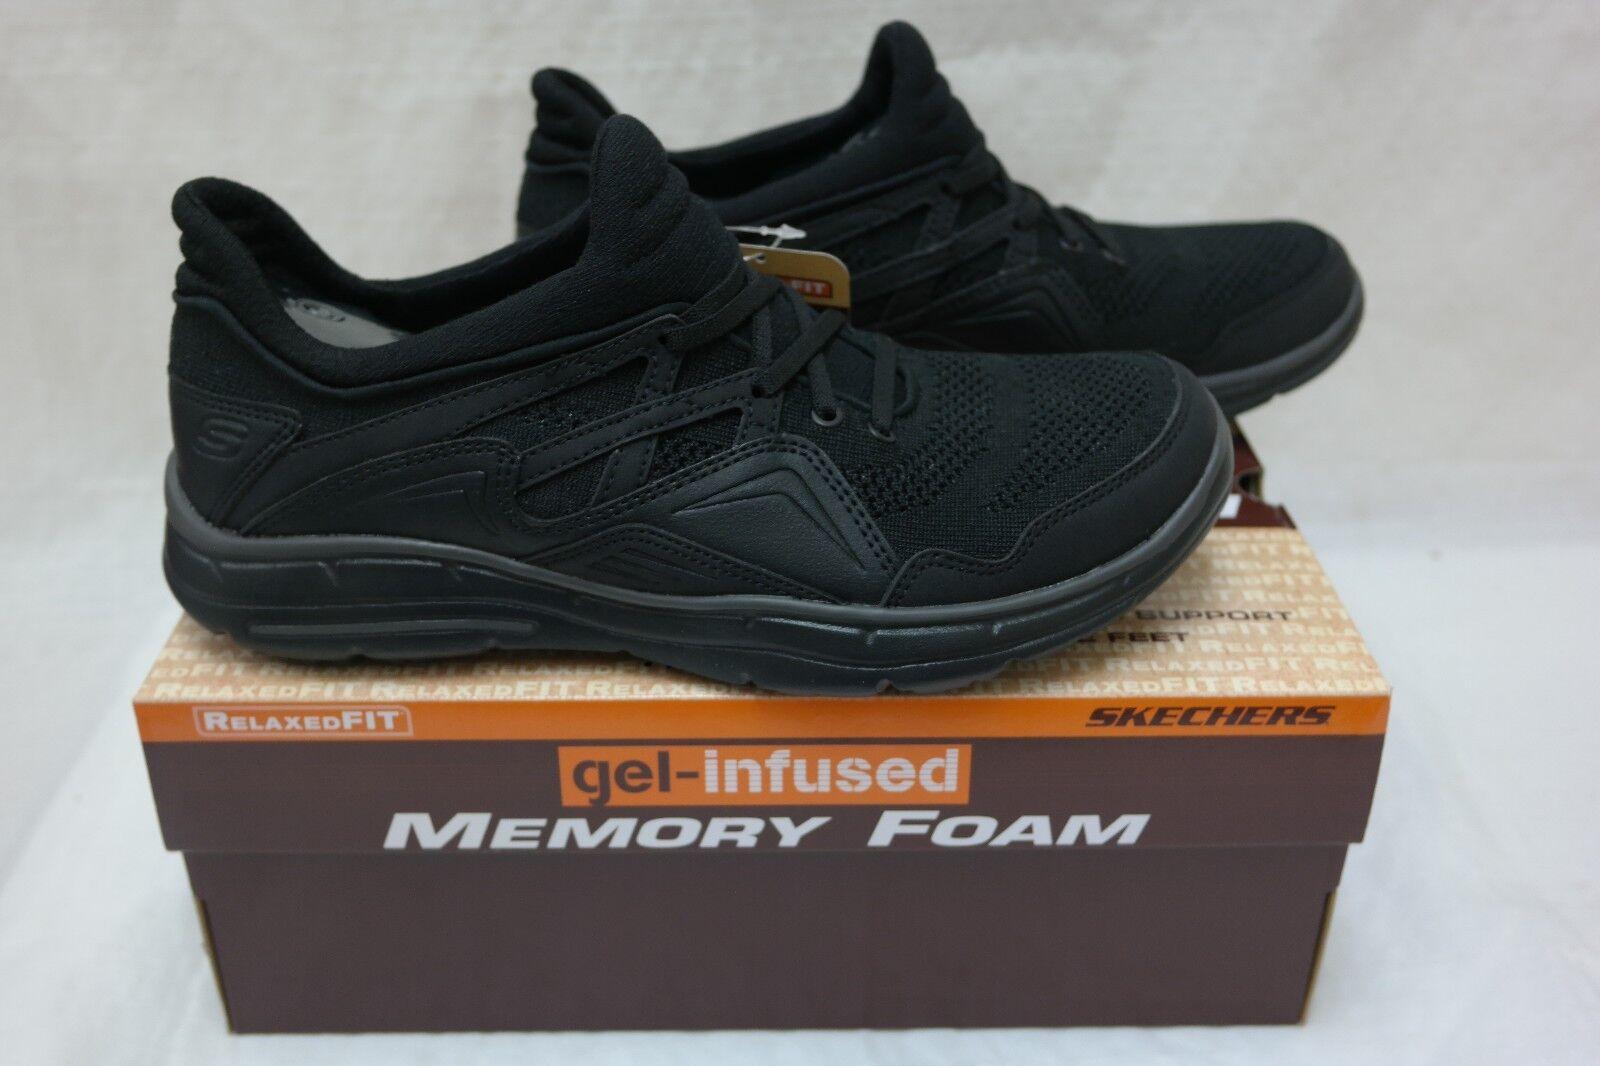 New!!  Skechers  Men's GLIDES-KENTON Casual Sneakers SN65011 Black/Black Z10 Brand discount